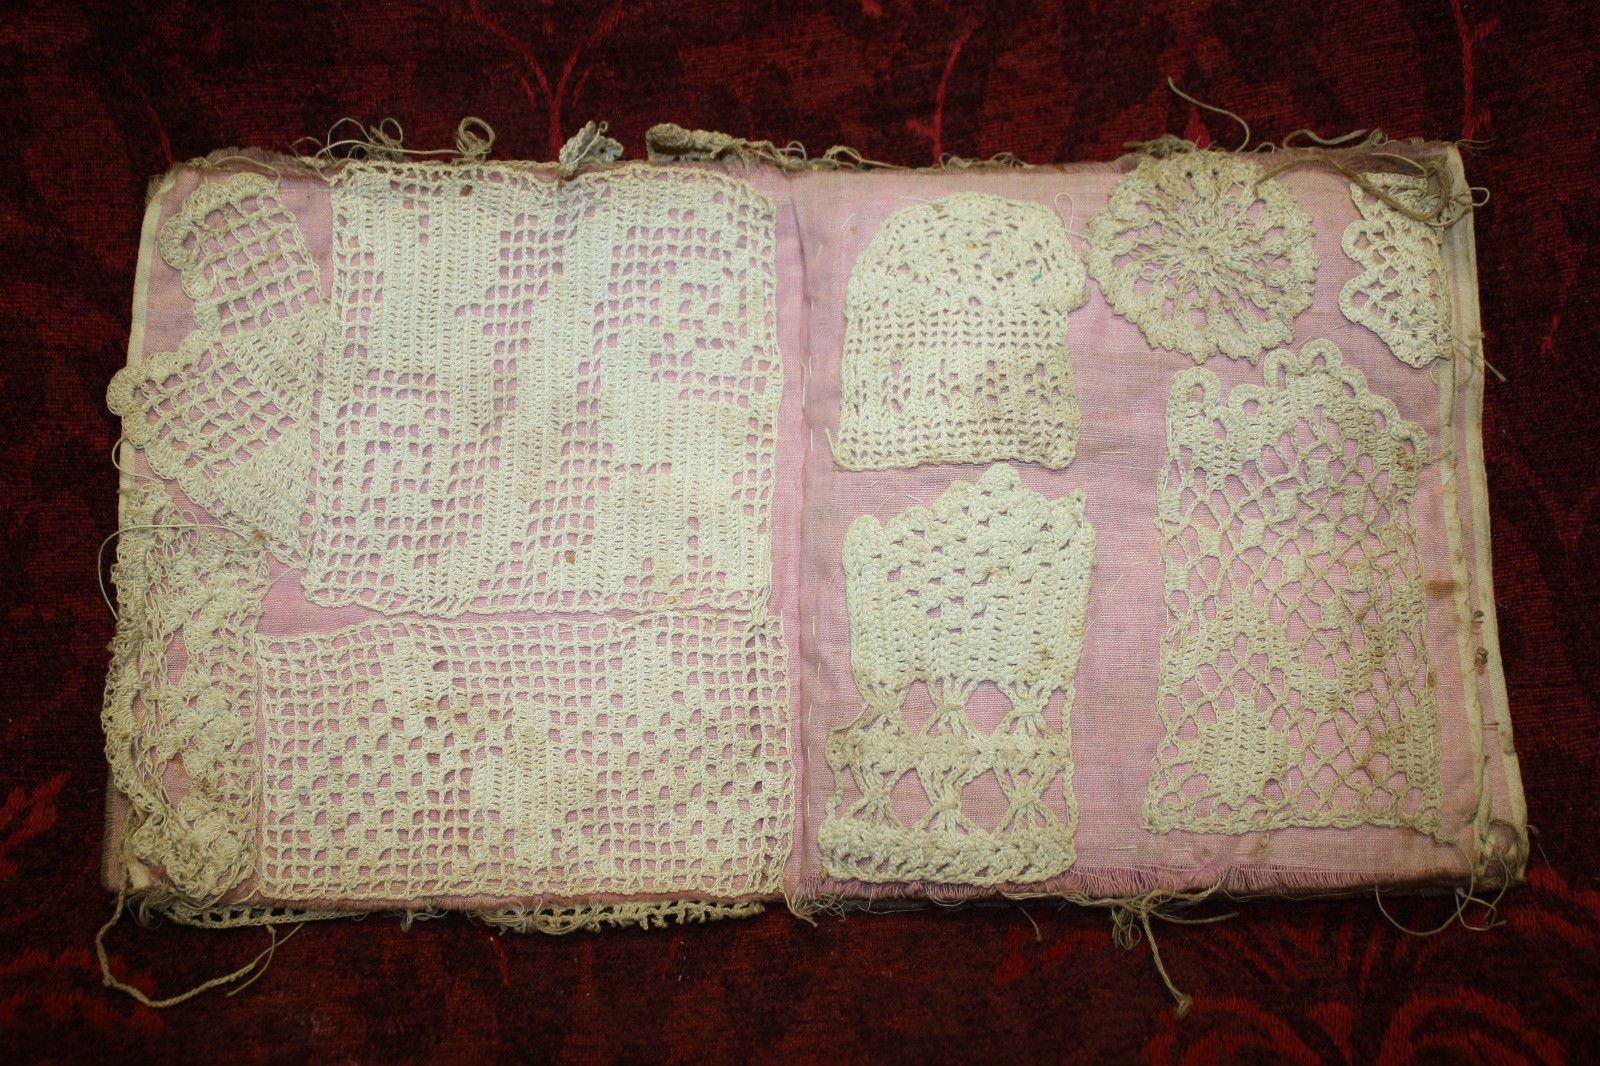 Sample Crochet Book Over 70 Hand Stitched Sampler Antique Handmade Fine Lace   eBay